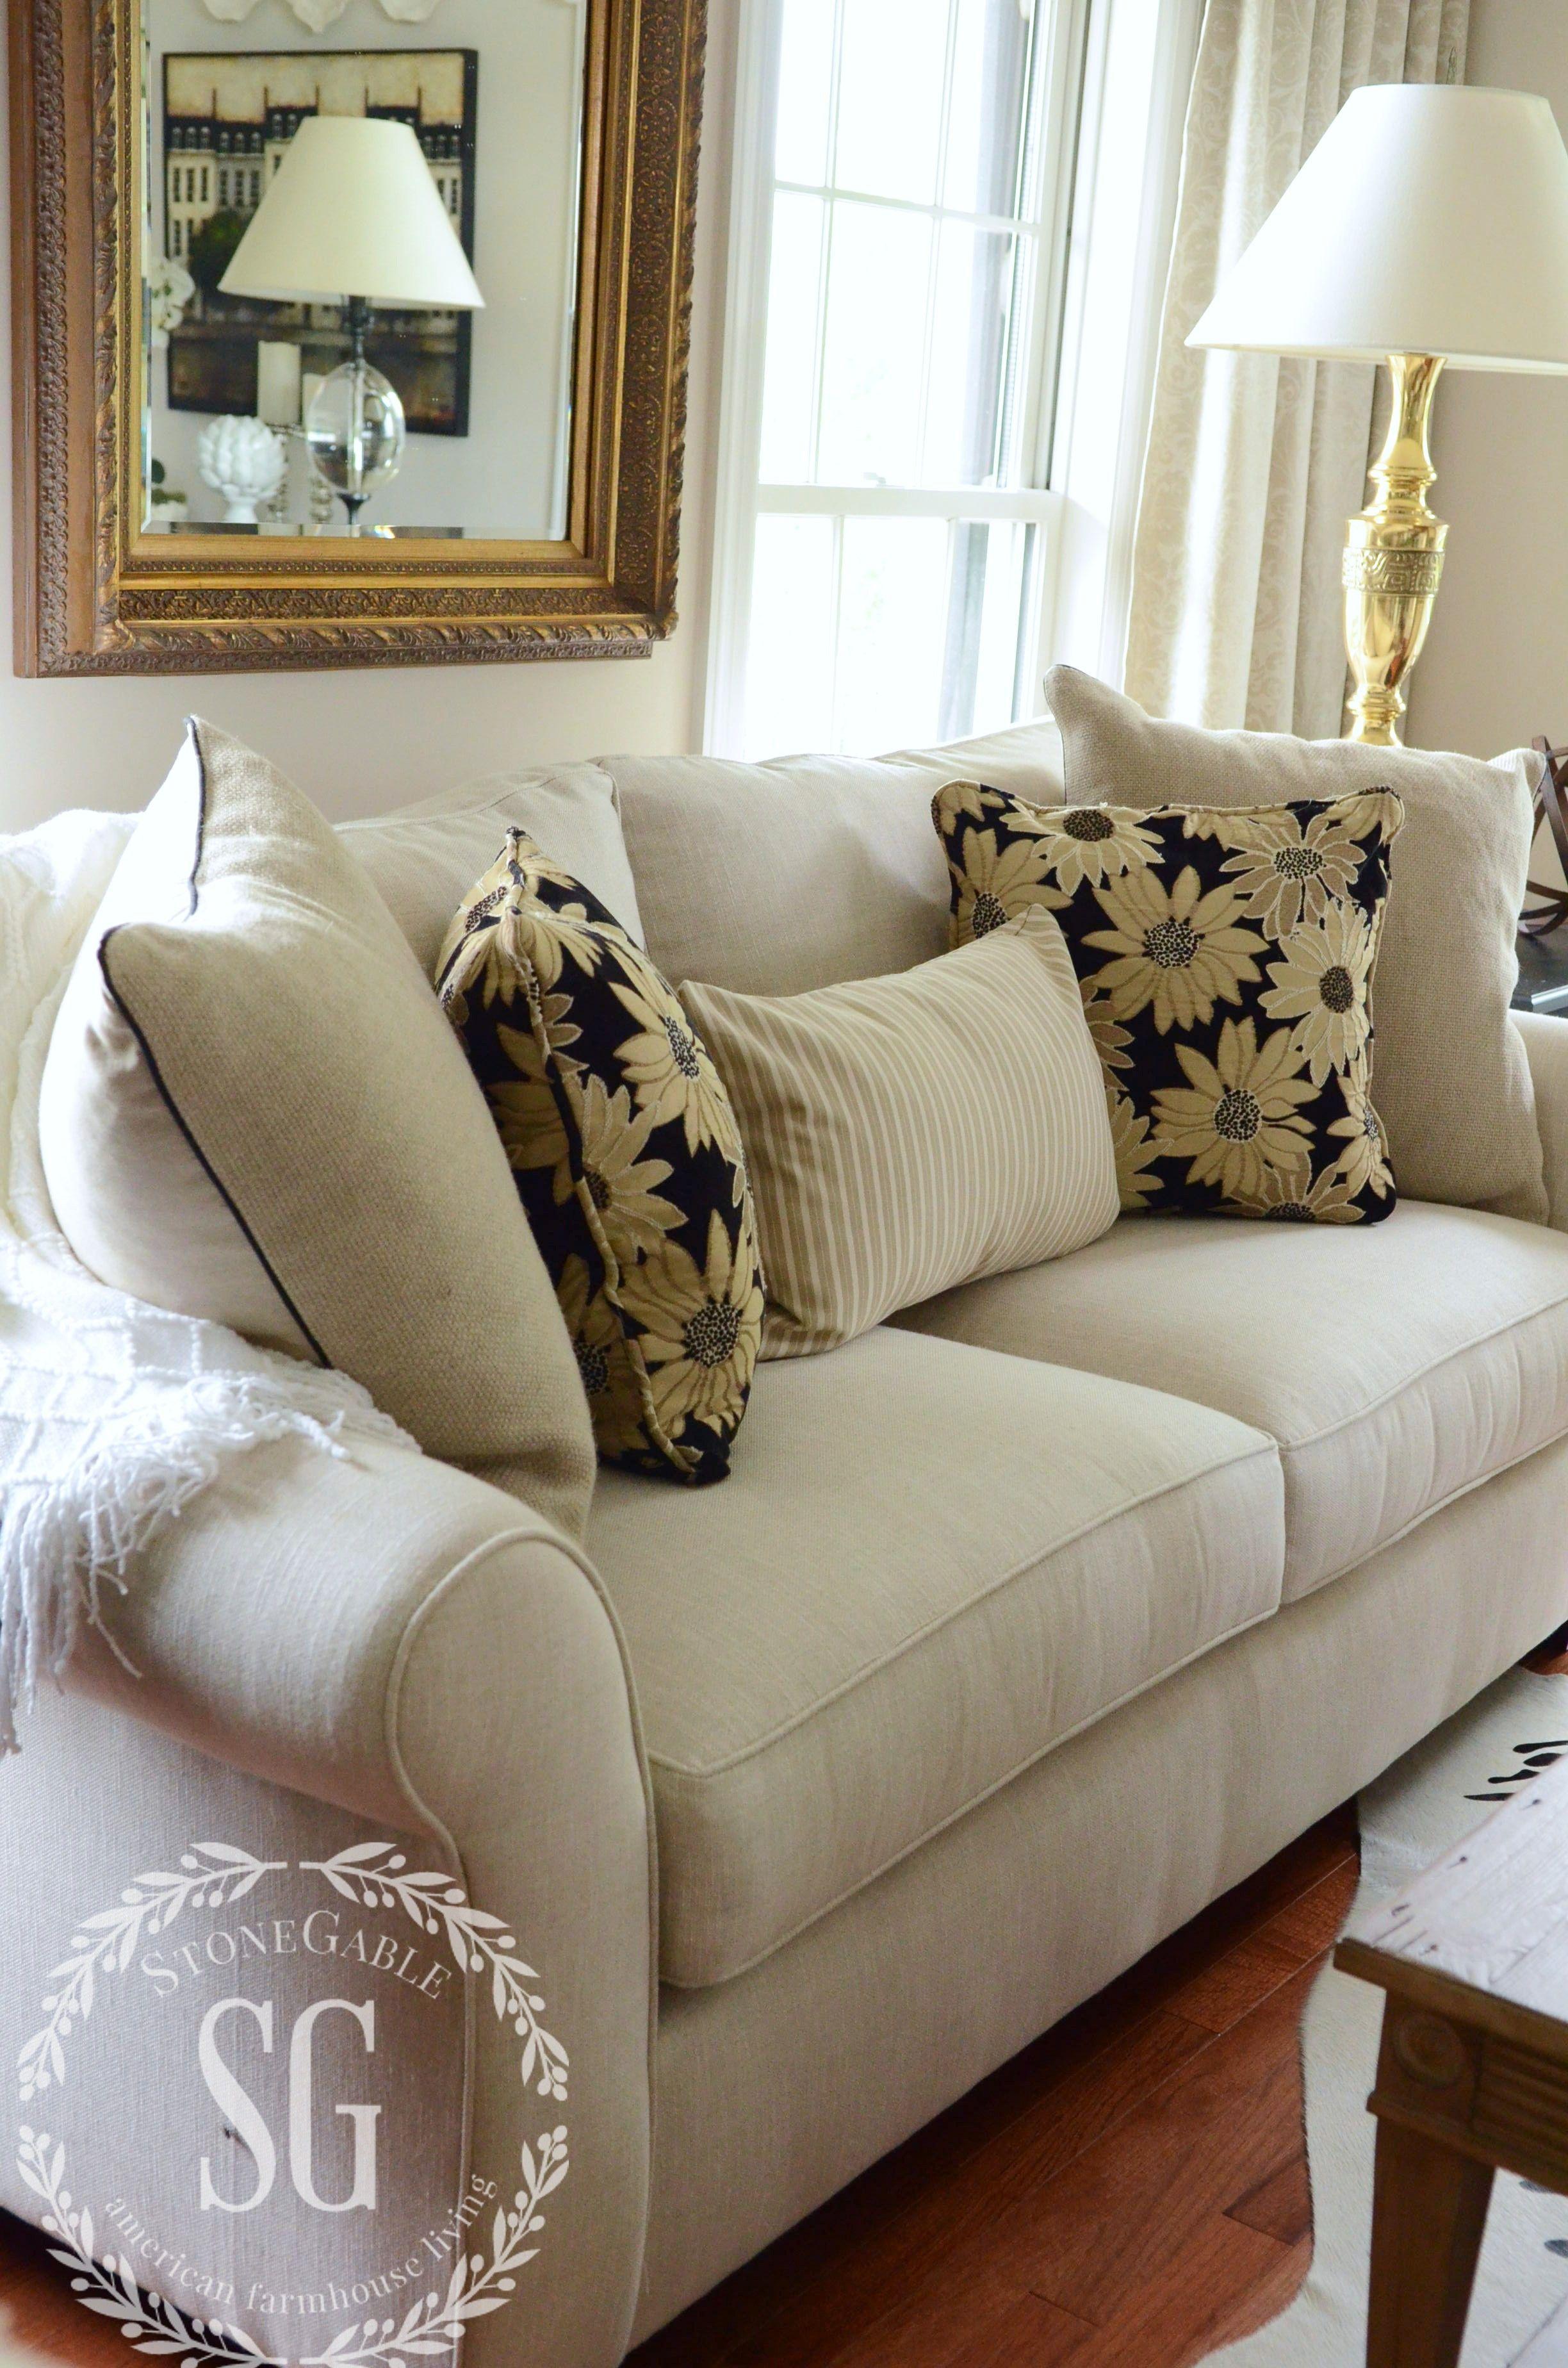 5 No Fail Tips For Arranging Pillows Stonegable Perfect Pillow Pillows Living Room Designs #pillows #for #living #room #sofa